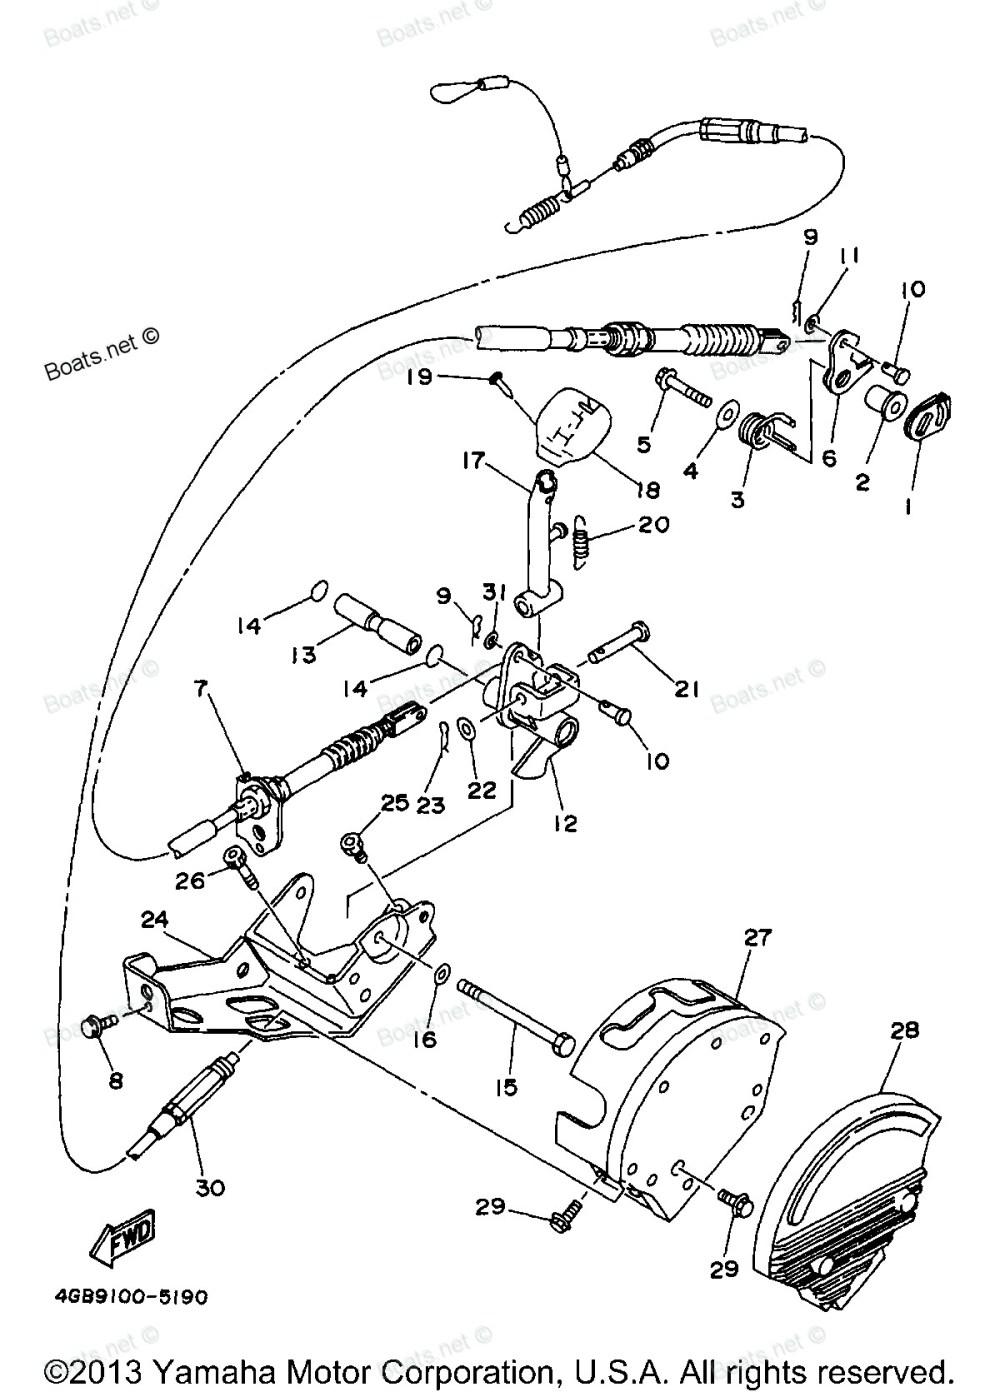 medium resolution of 1200x1677 les paul recording wiring diagram copy gibson sg 57 classic wiring